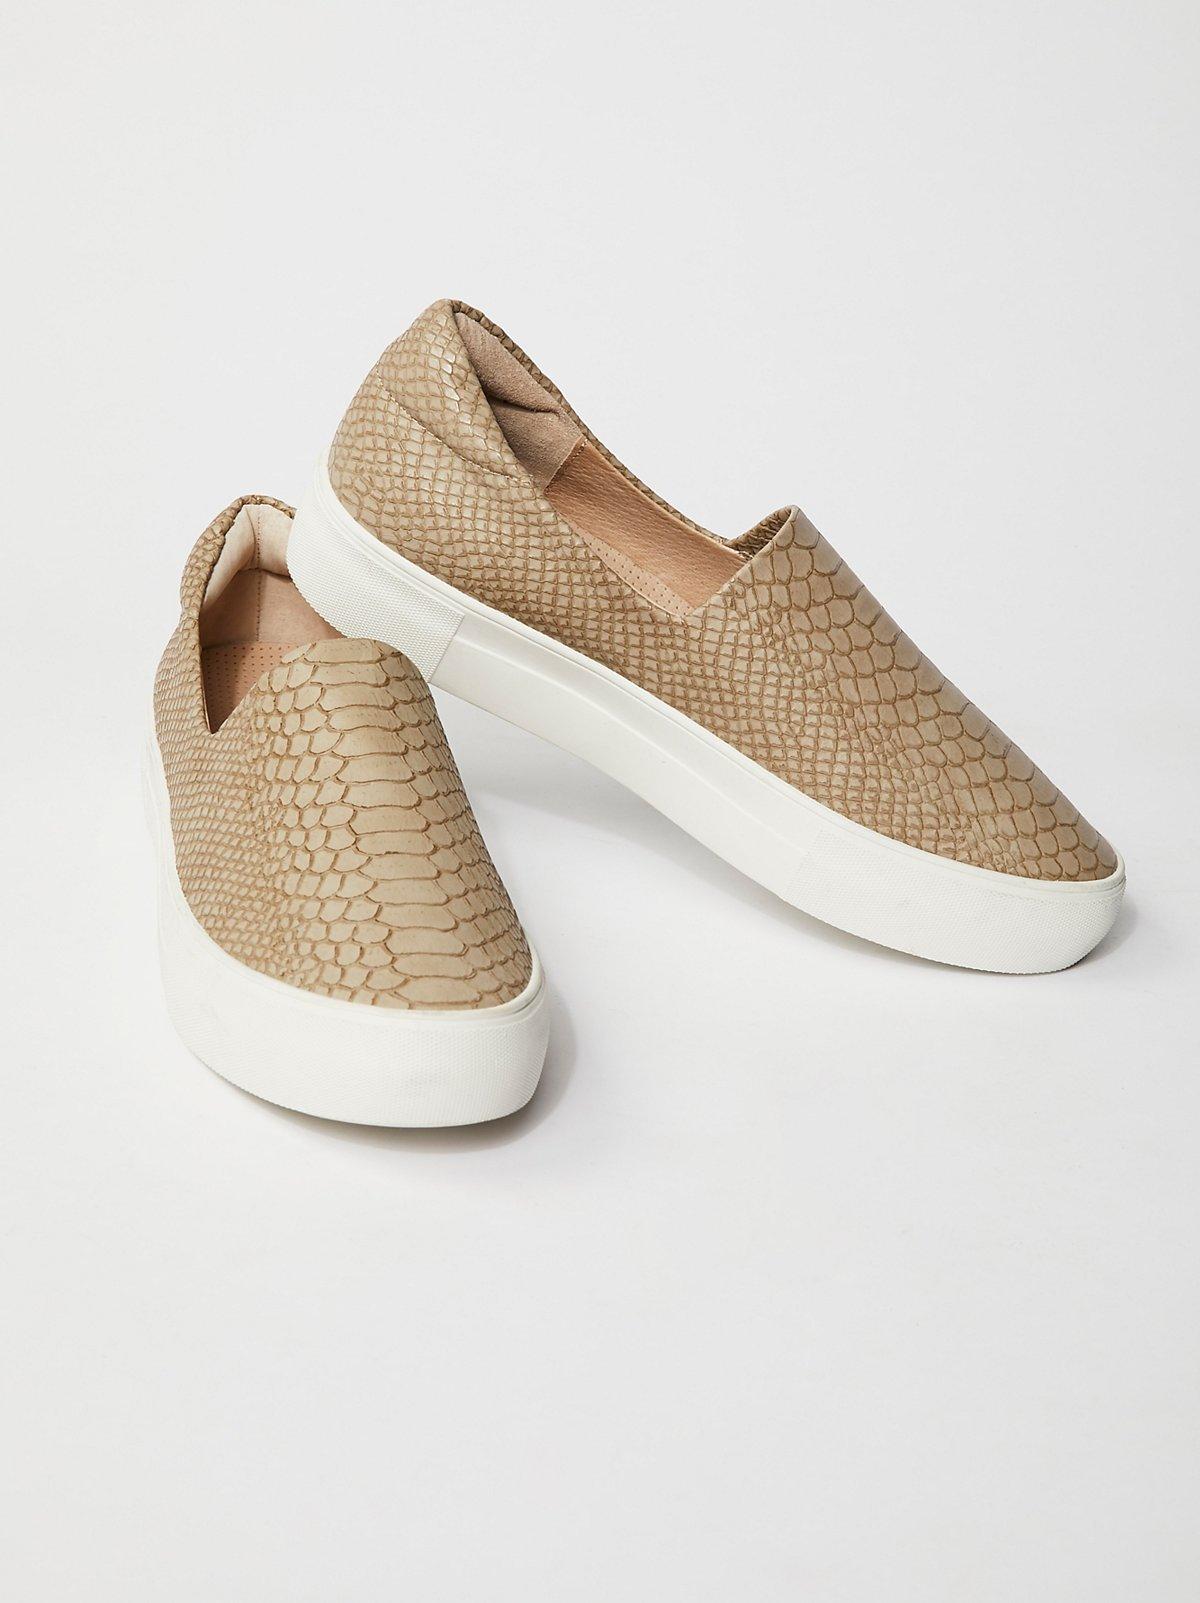 Matchpoint厚底运动鞋